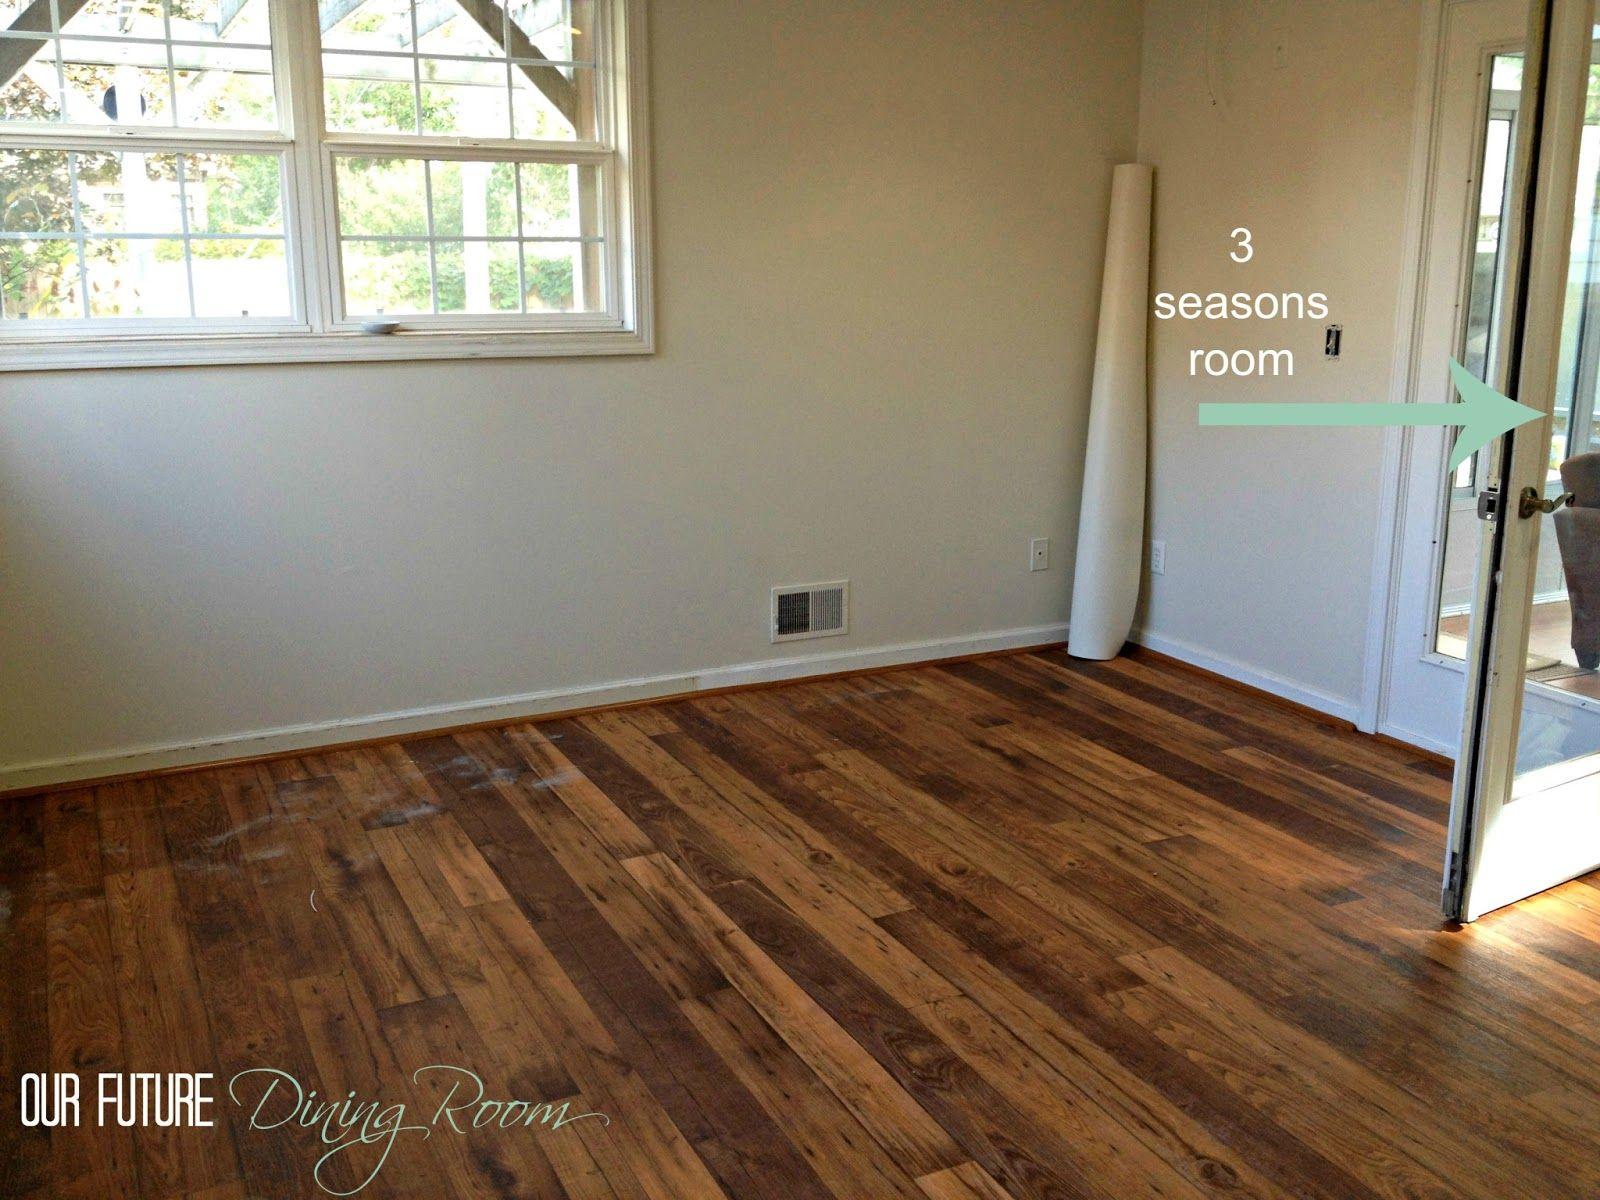 linoleum wood flooring   faux hardwood we went with a